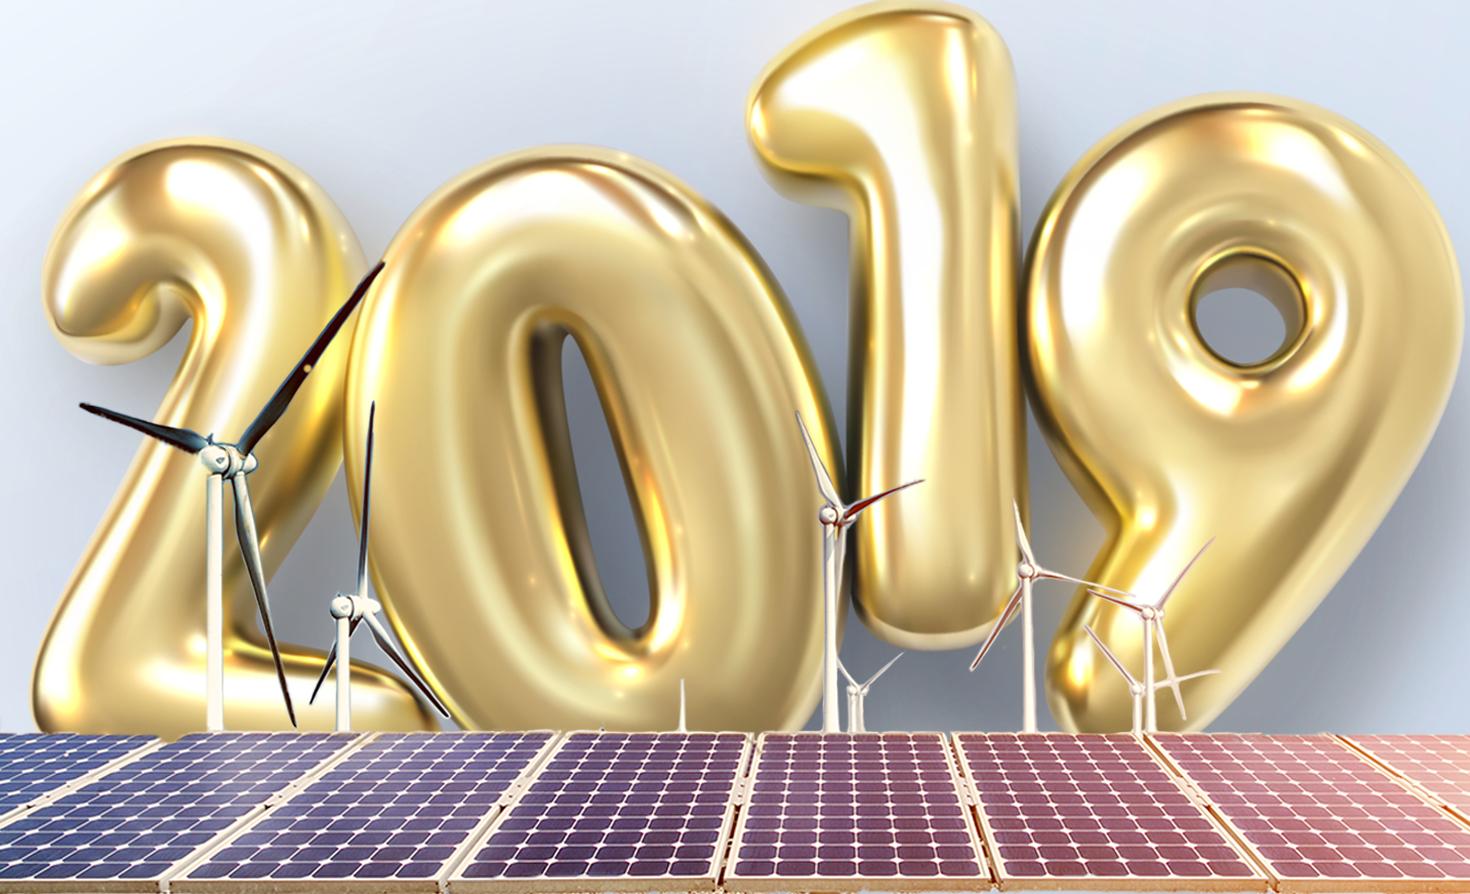 Potential energy: 7 hopeful power prognostications for 2019